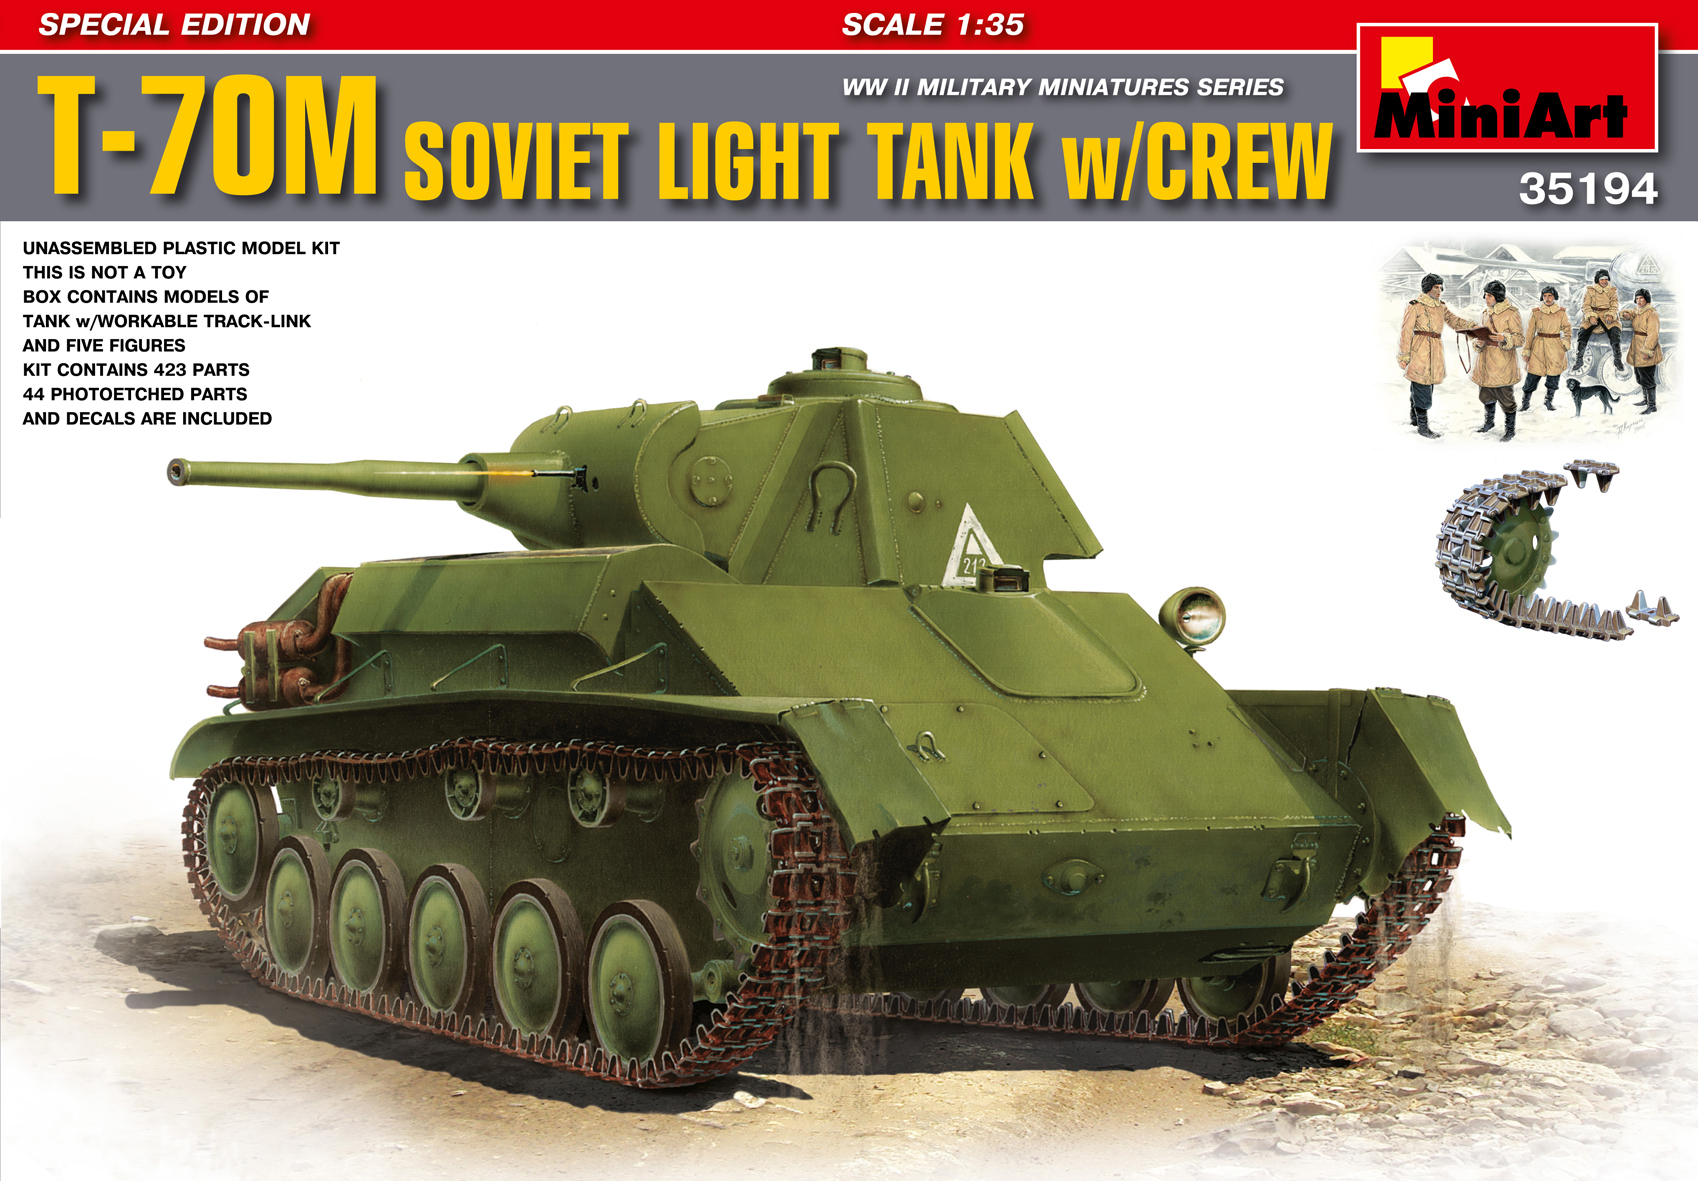 T-70M SOVIET LIGHT TANK w/CREW. SPECIAL EDITION